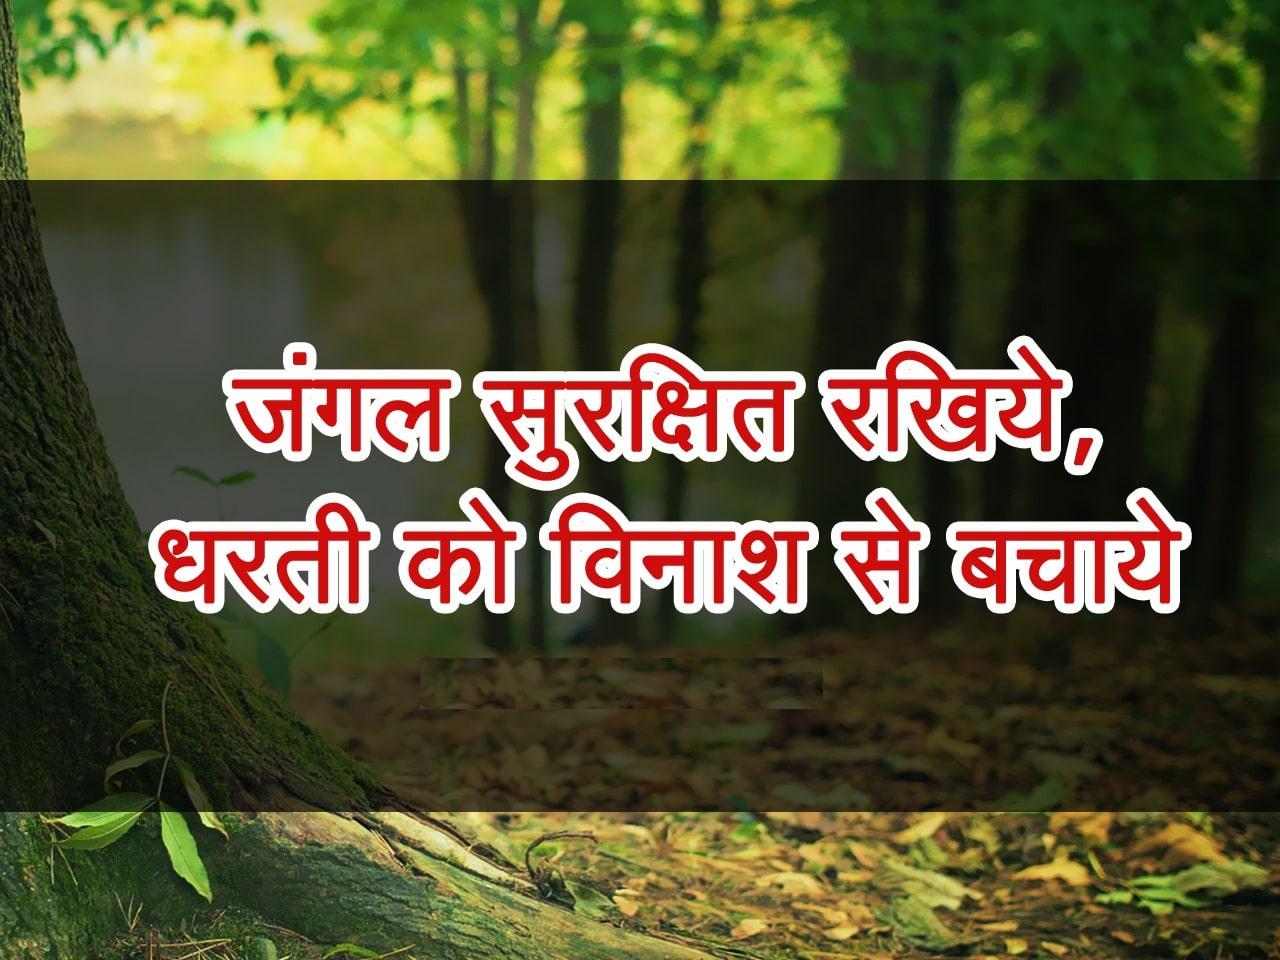 Earth Day Slogan In Hindi